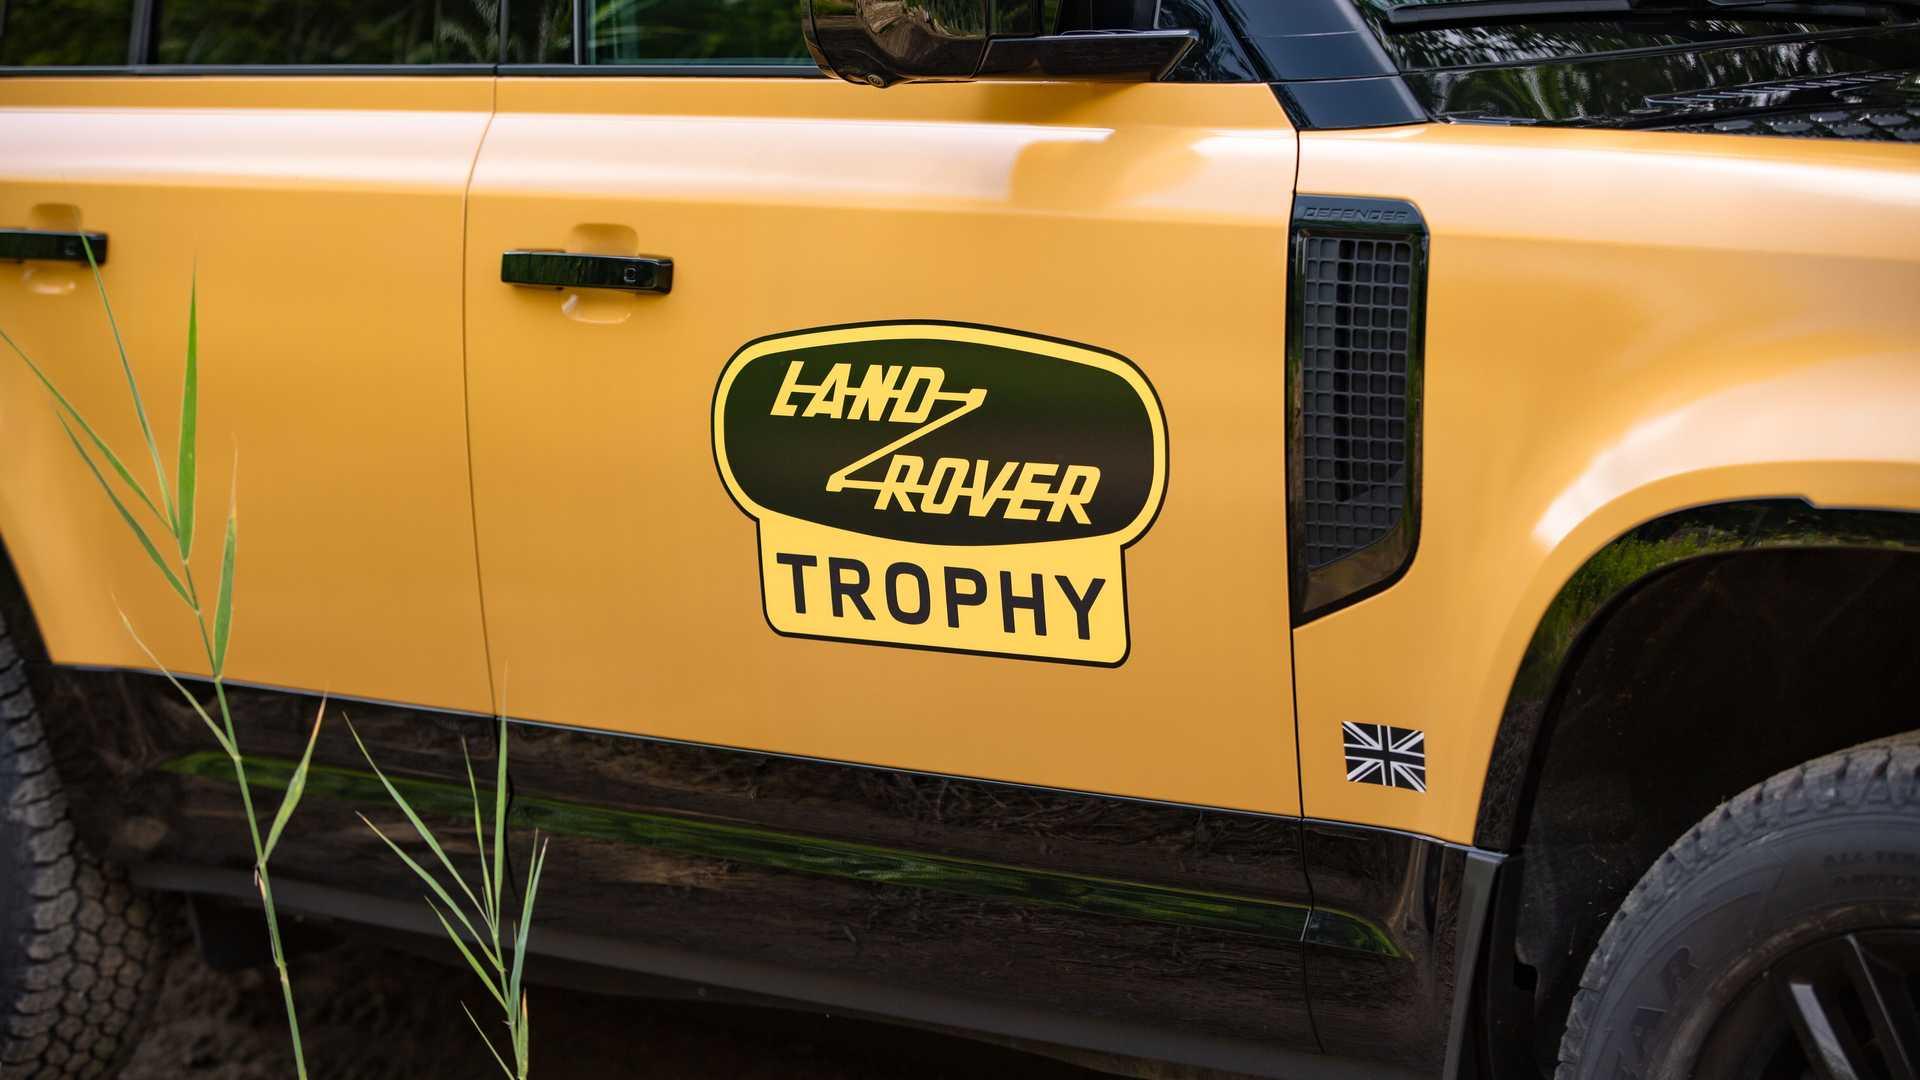 Land-Rover-Defender-Trophy-Edition-3